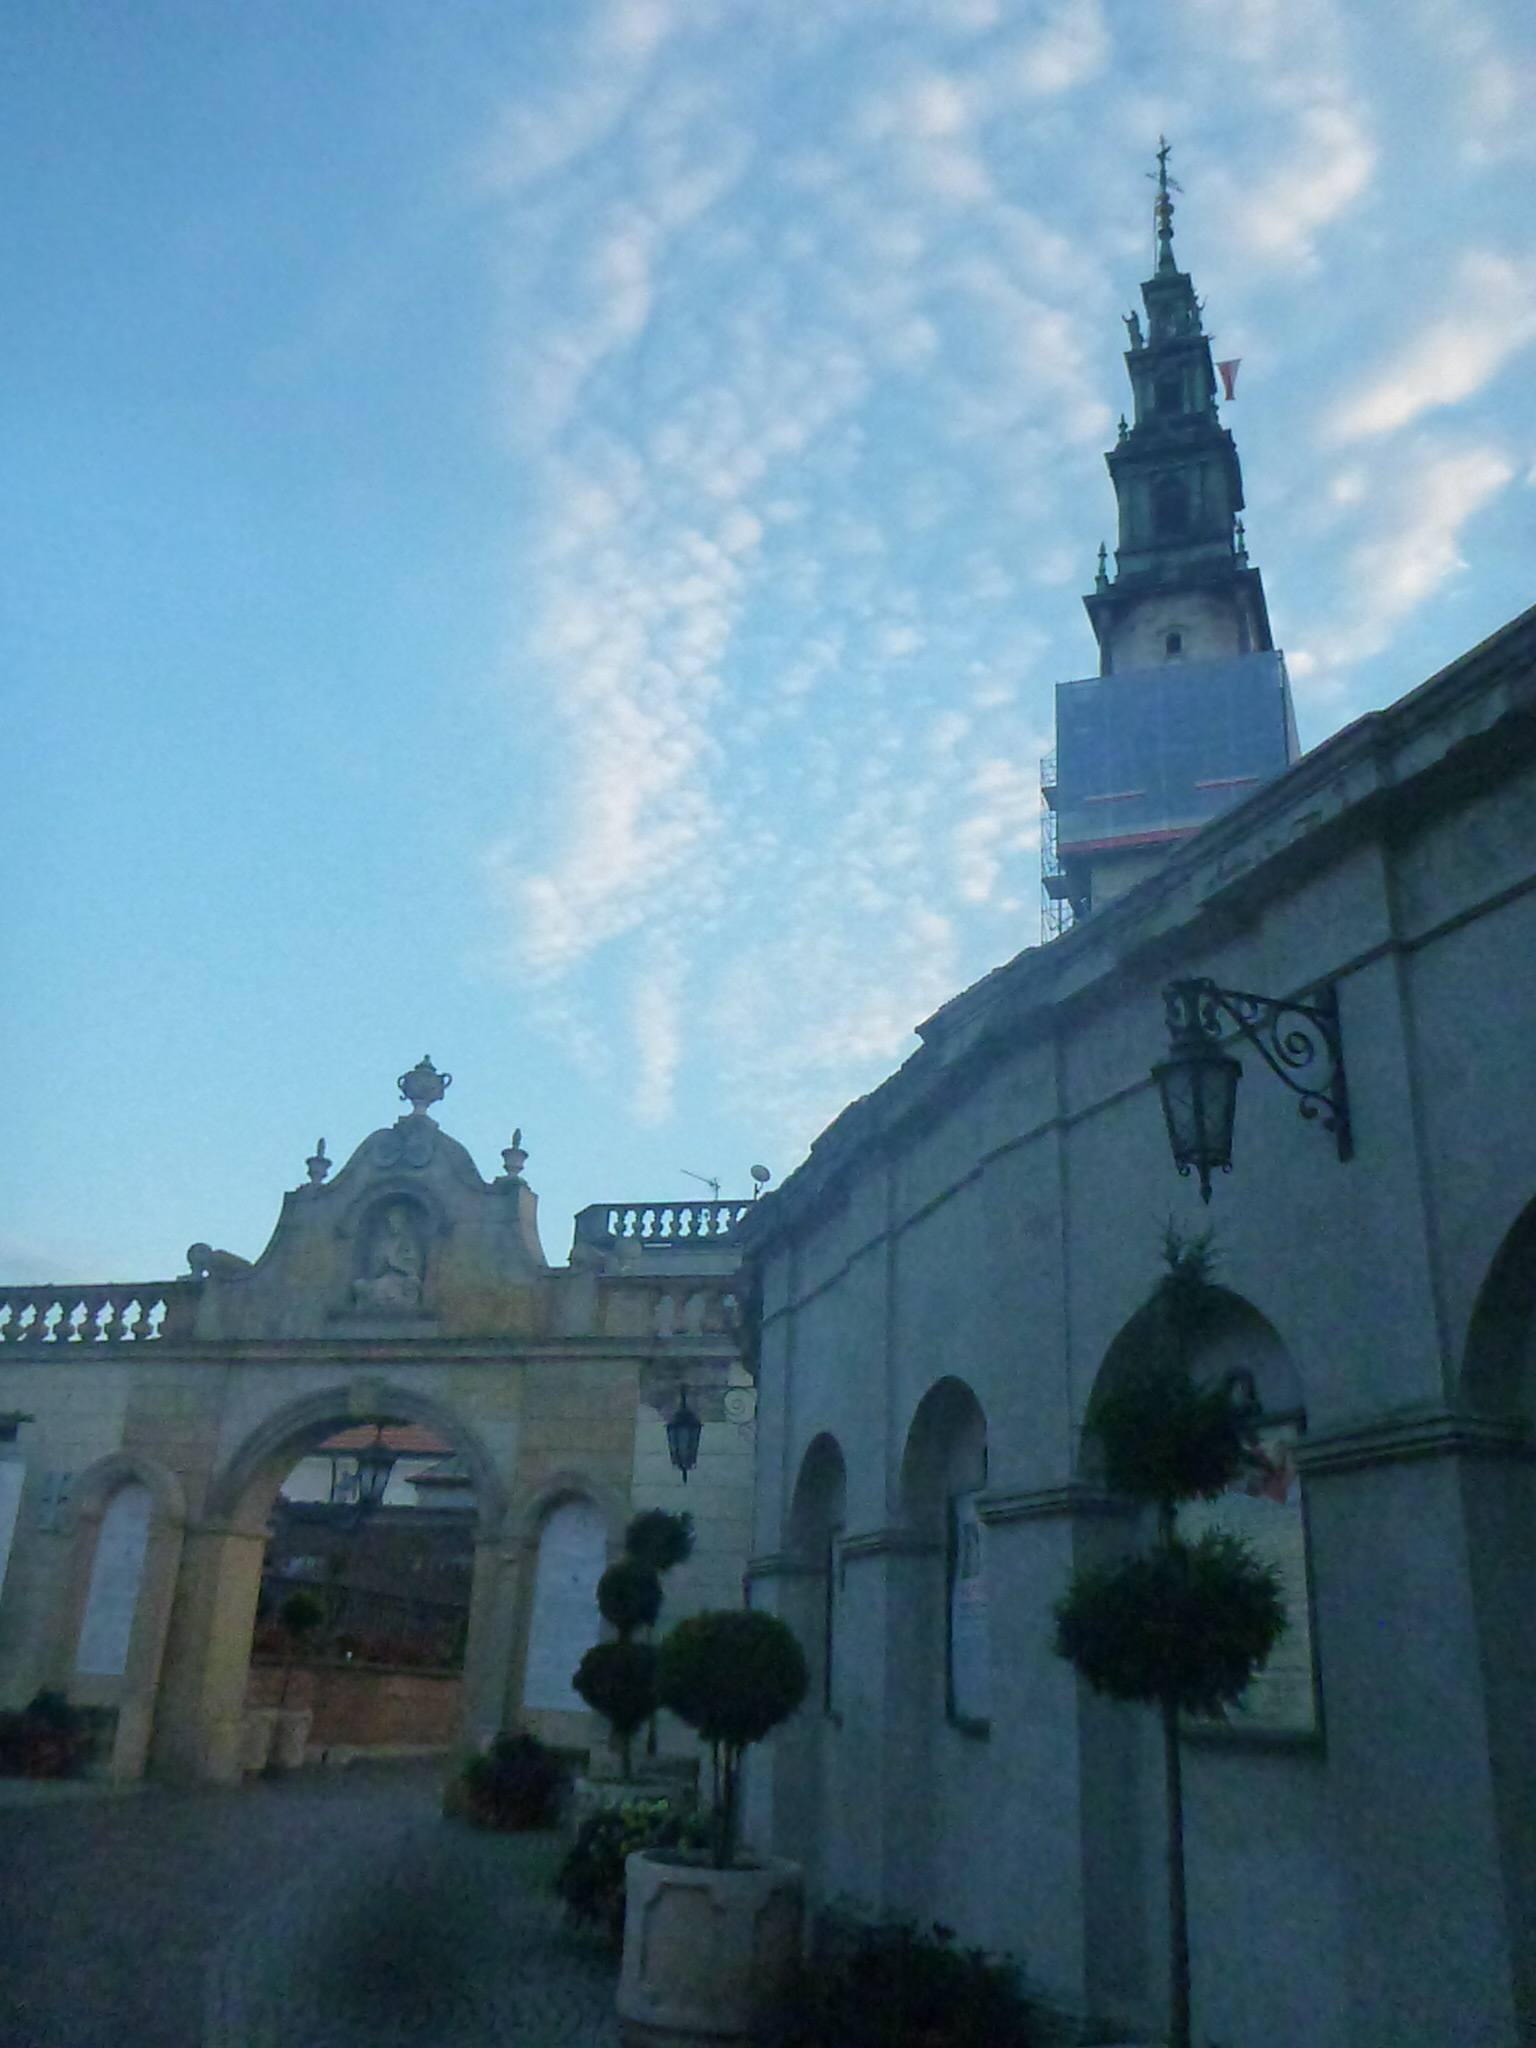 Attending Sunday Morning Mass at Jasna Góra Monastery